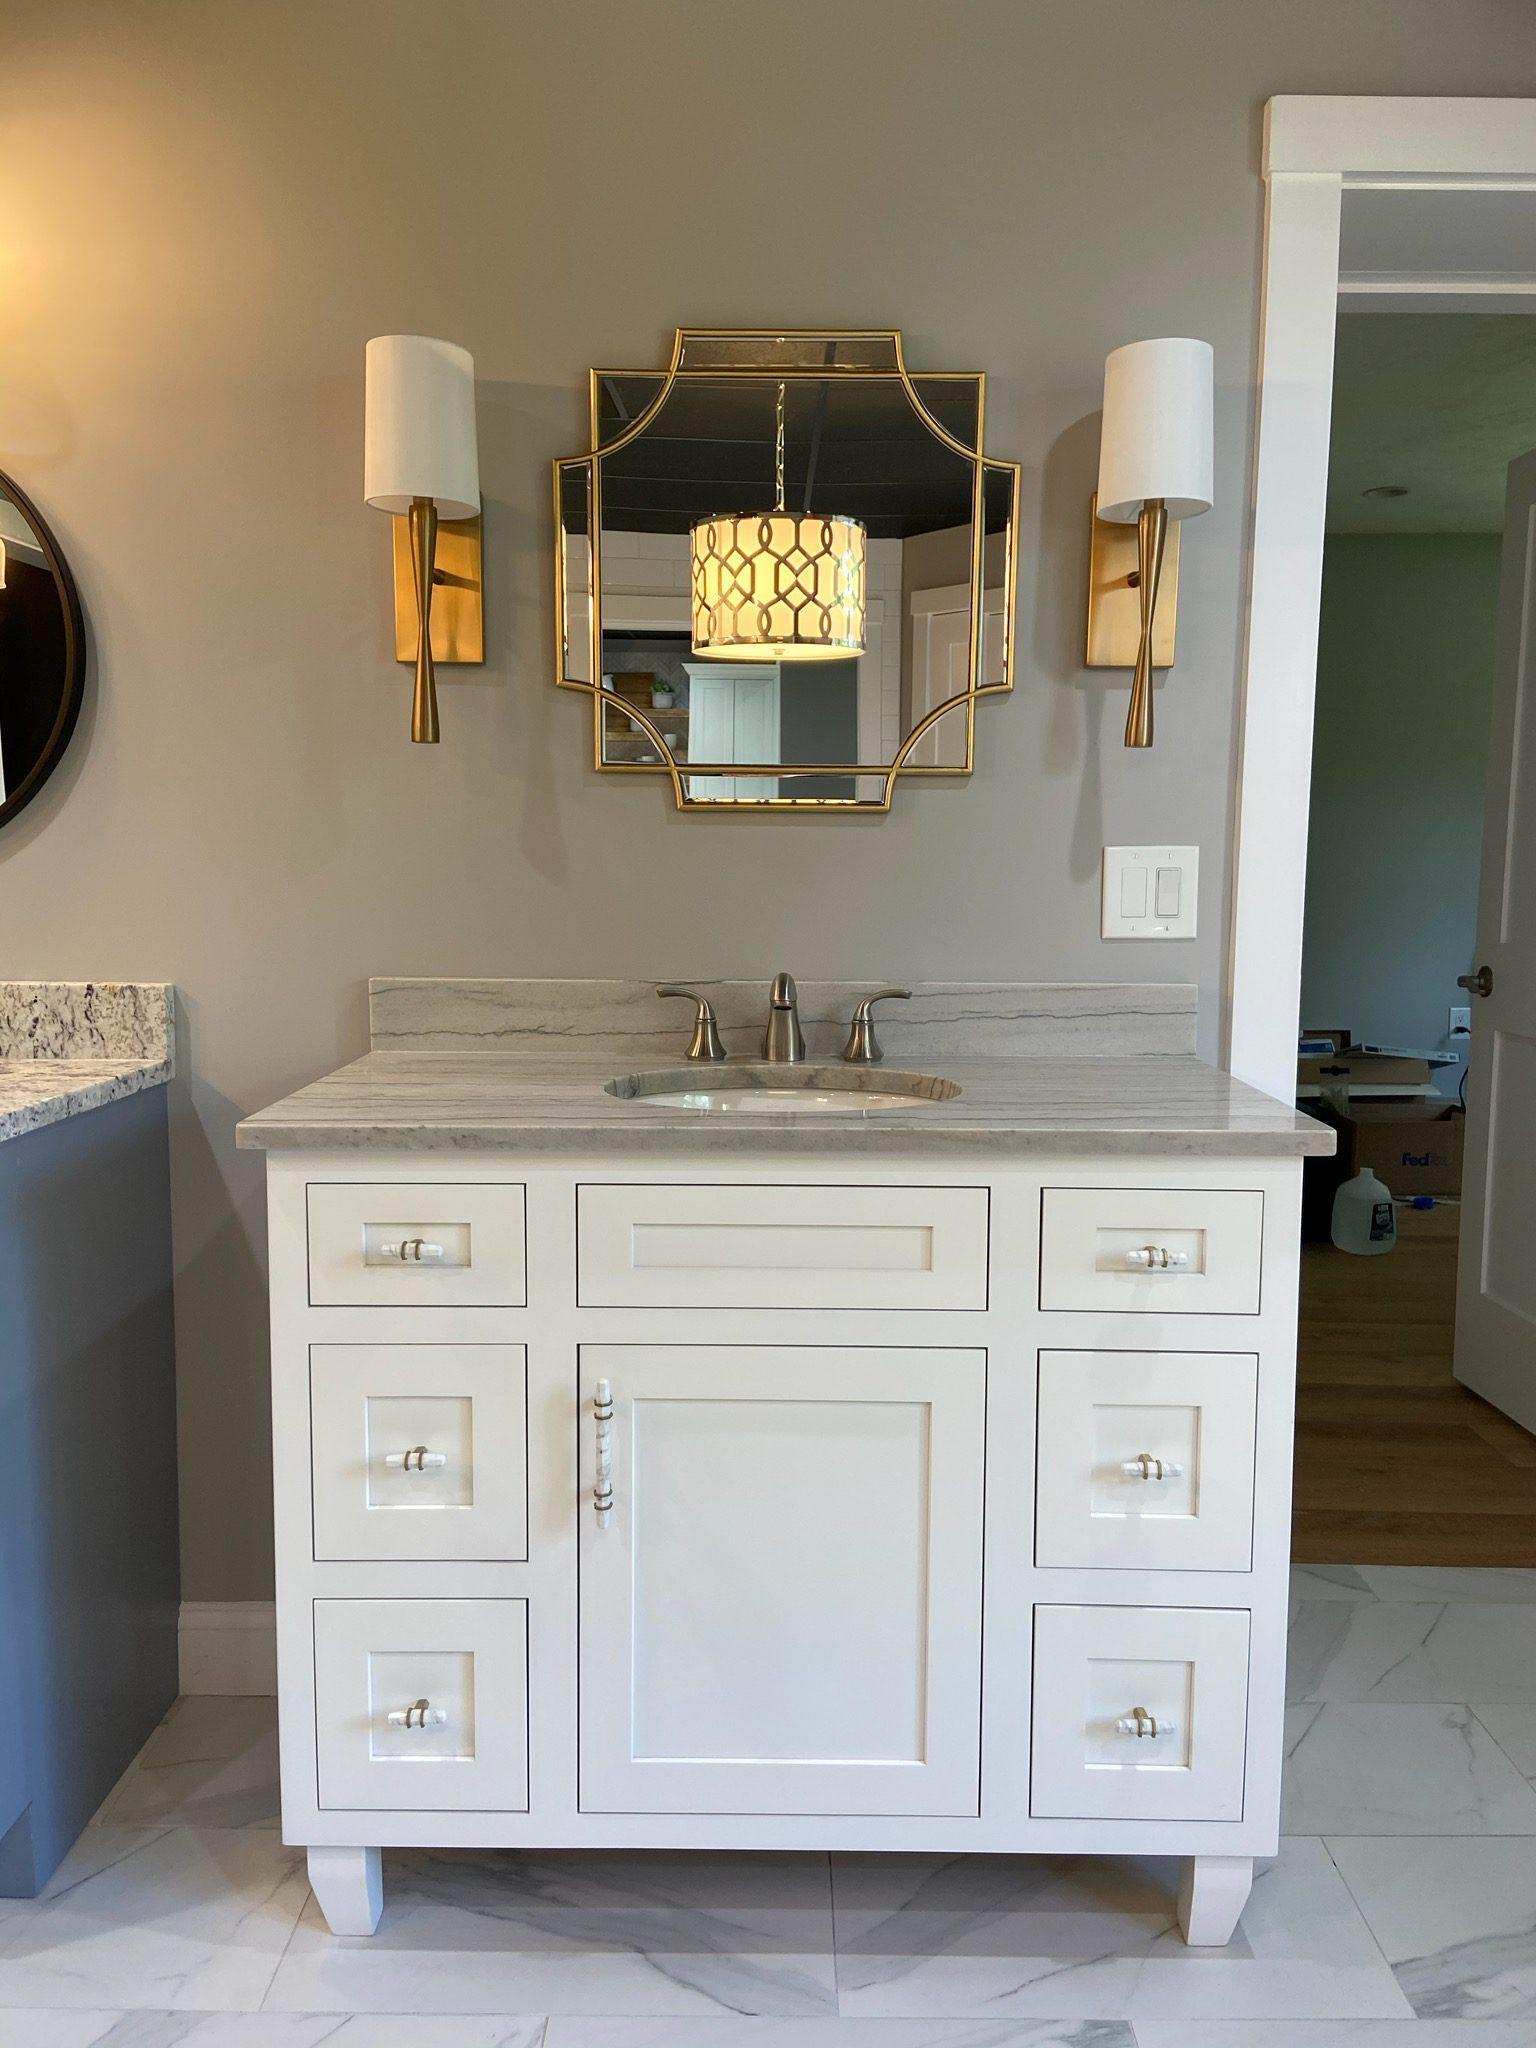 Bathroom Decorative Lighting | Interior Designer